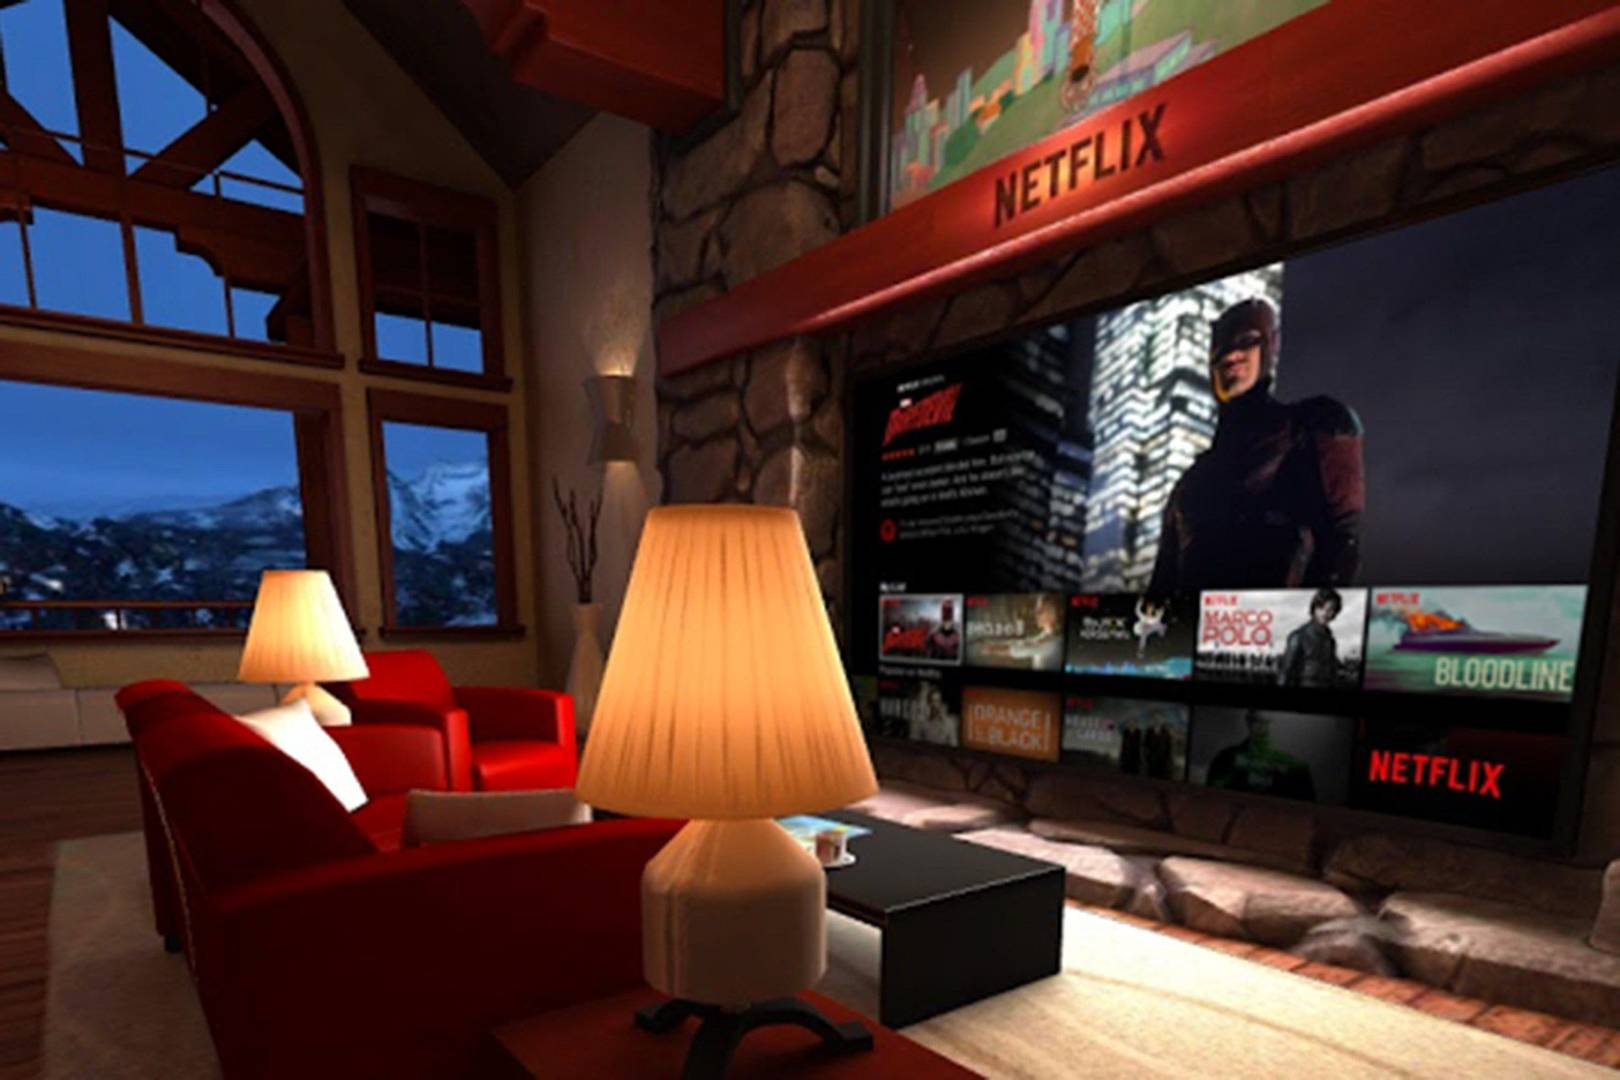 Netflix has built a VR living room for your next series binge